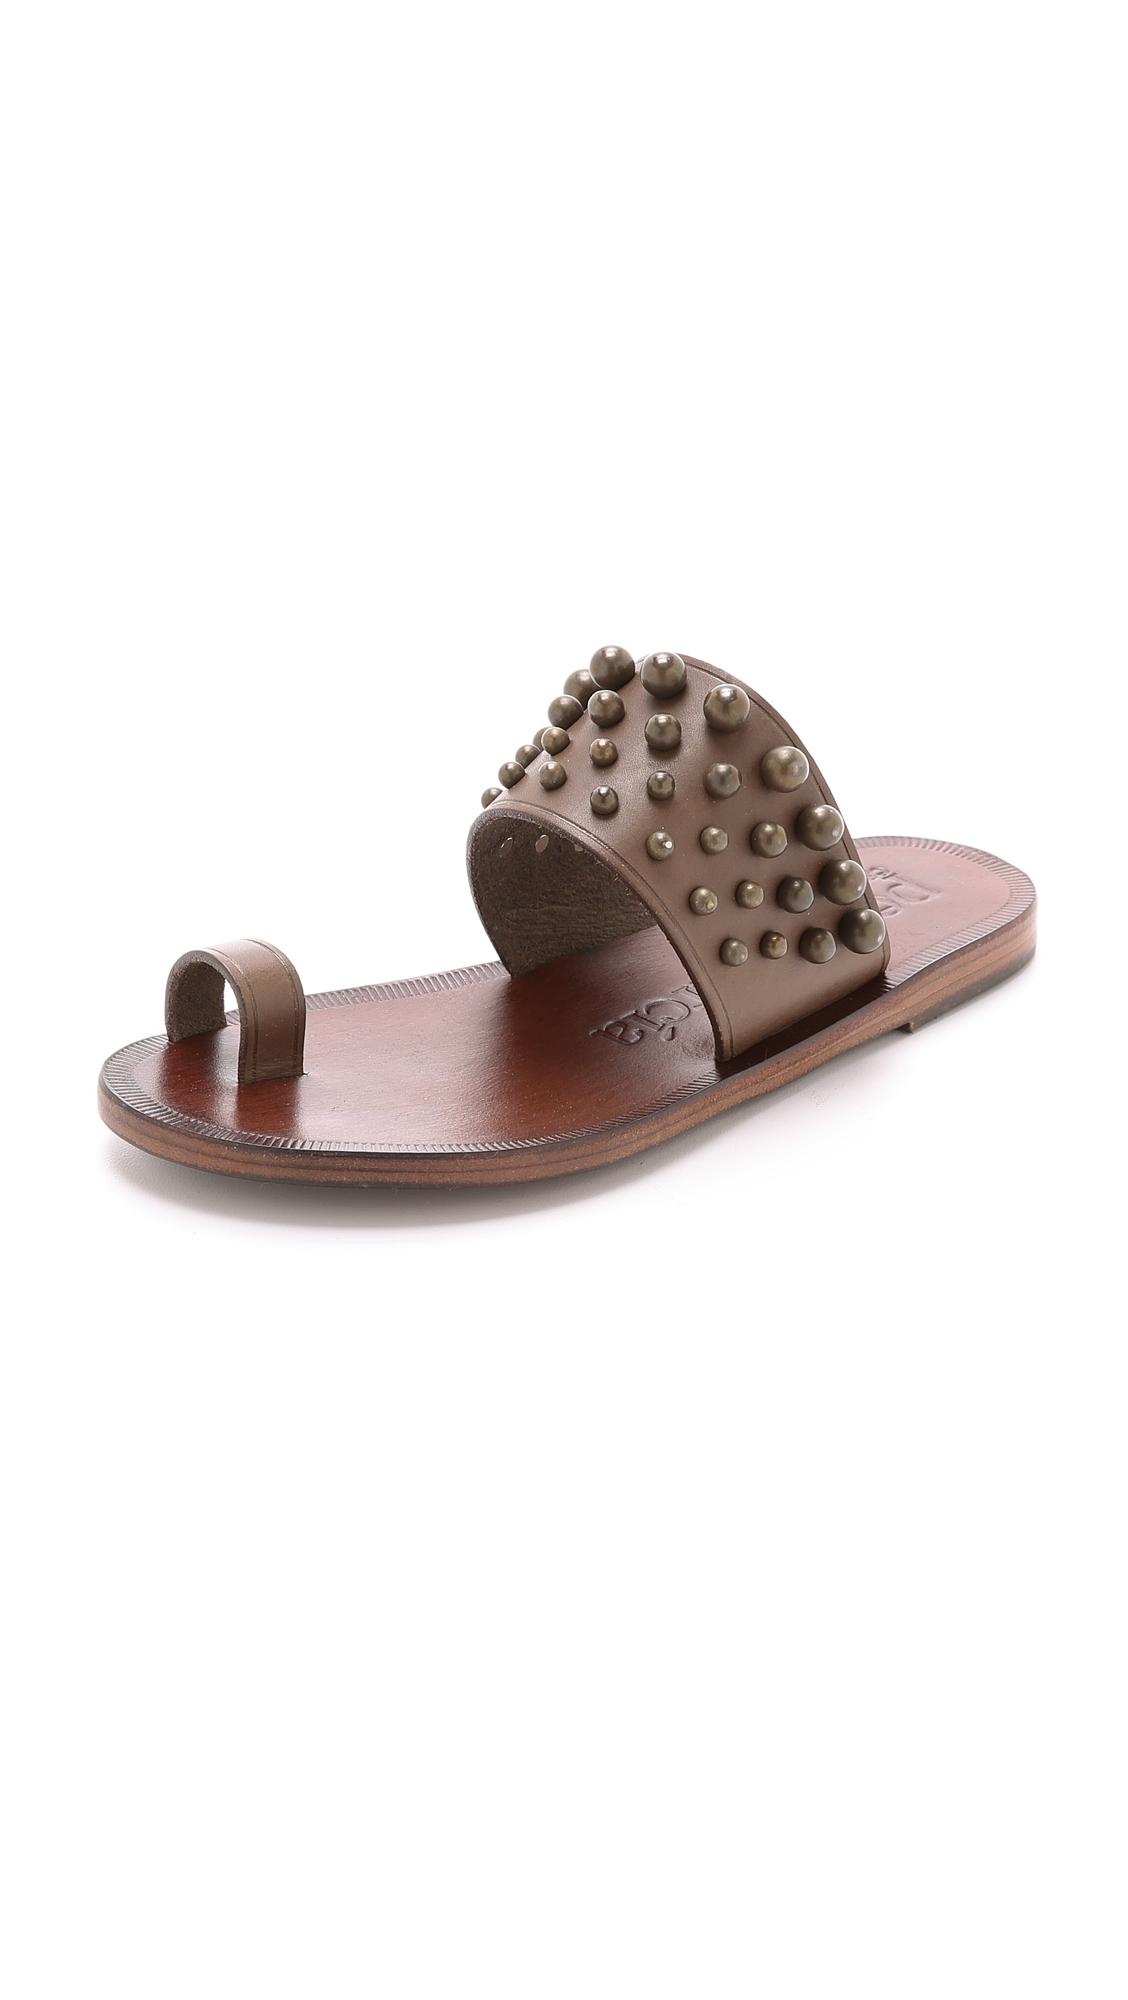 Lyst Pedro Garcia Zeta Studded Toe Ring Sandals Piombo